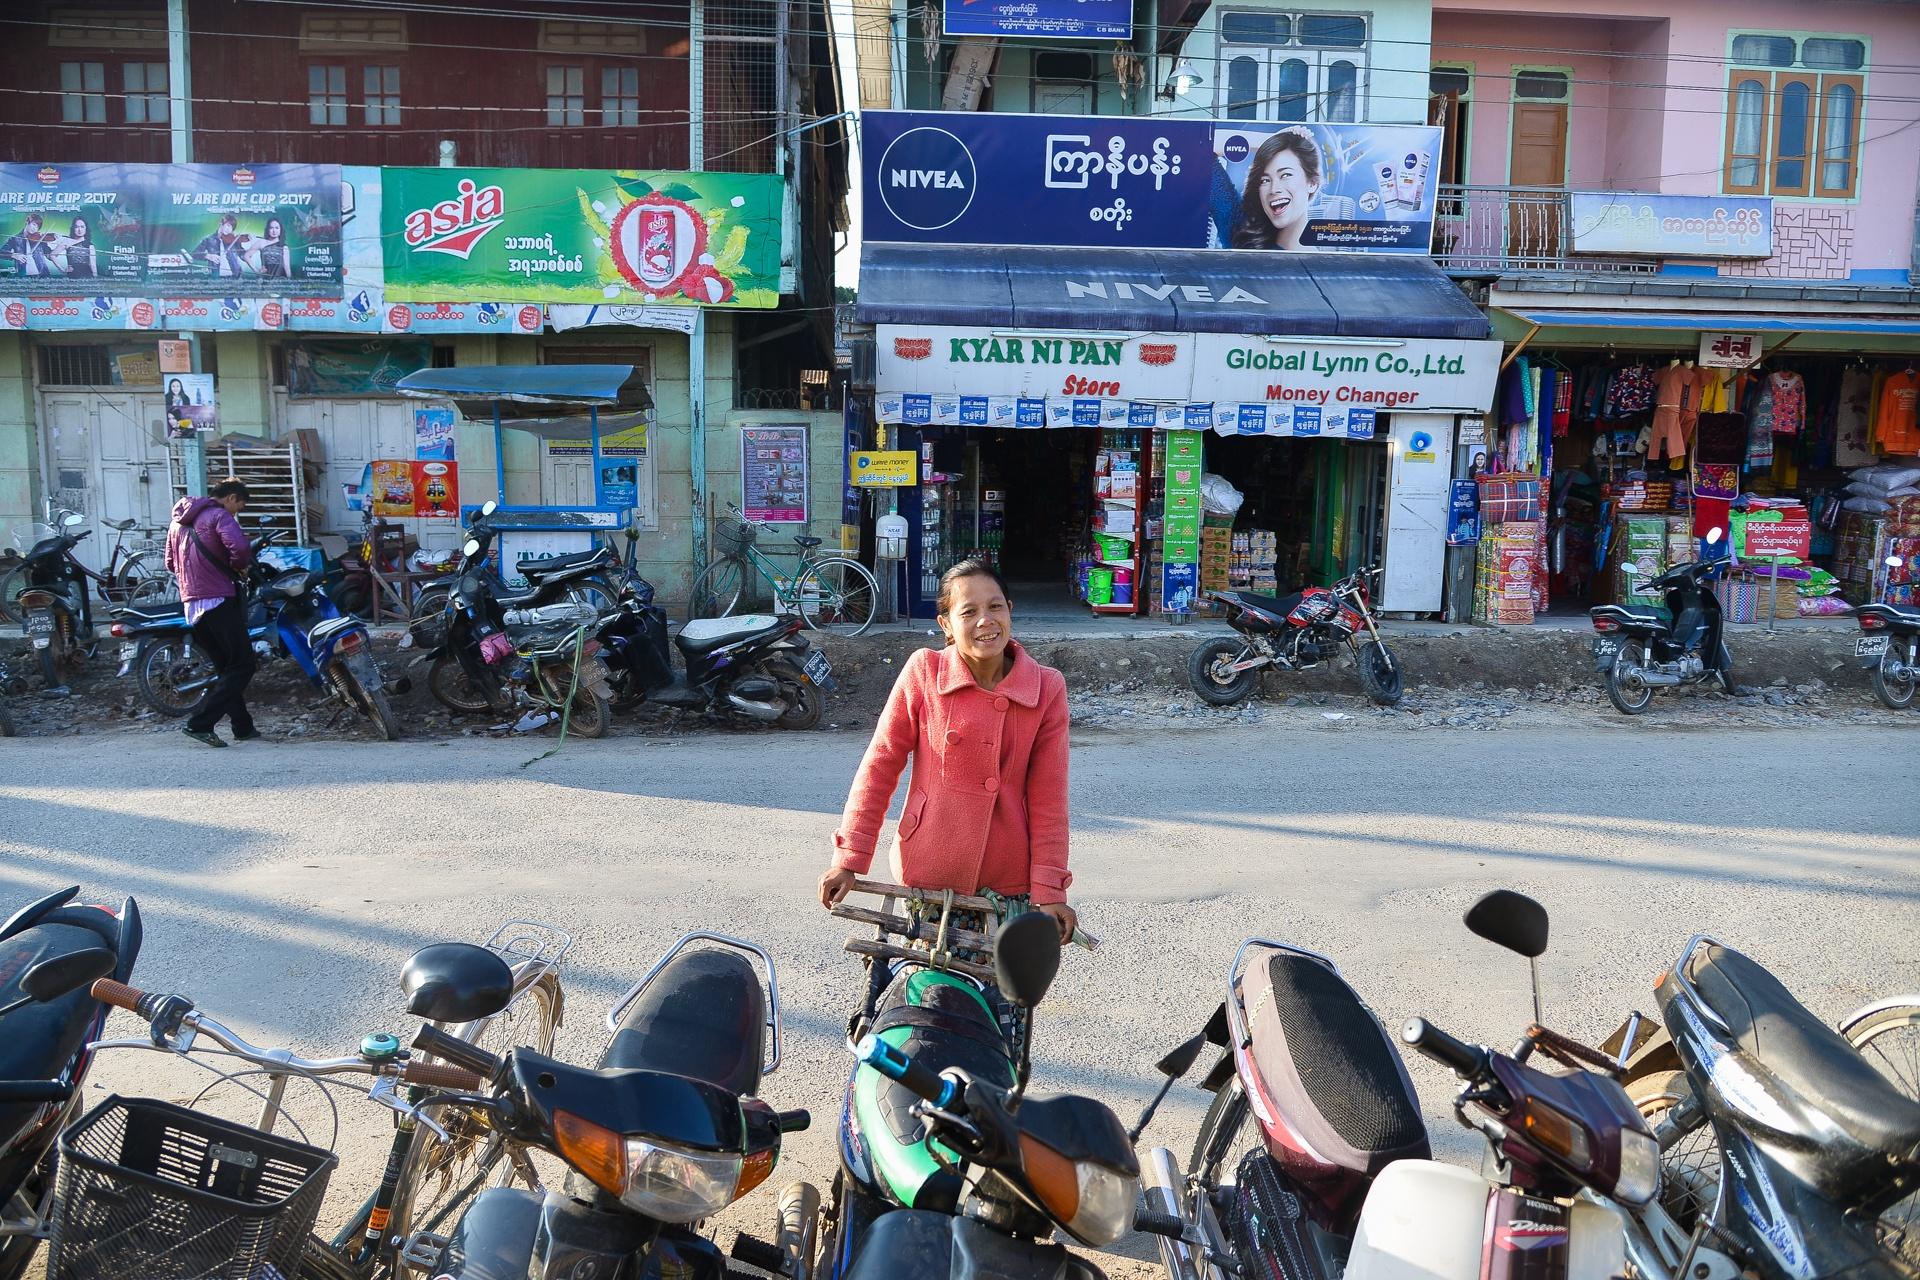 Myanmar - mien dat la ngu quen hinh anh 20